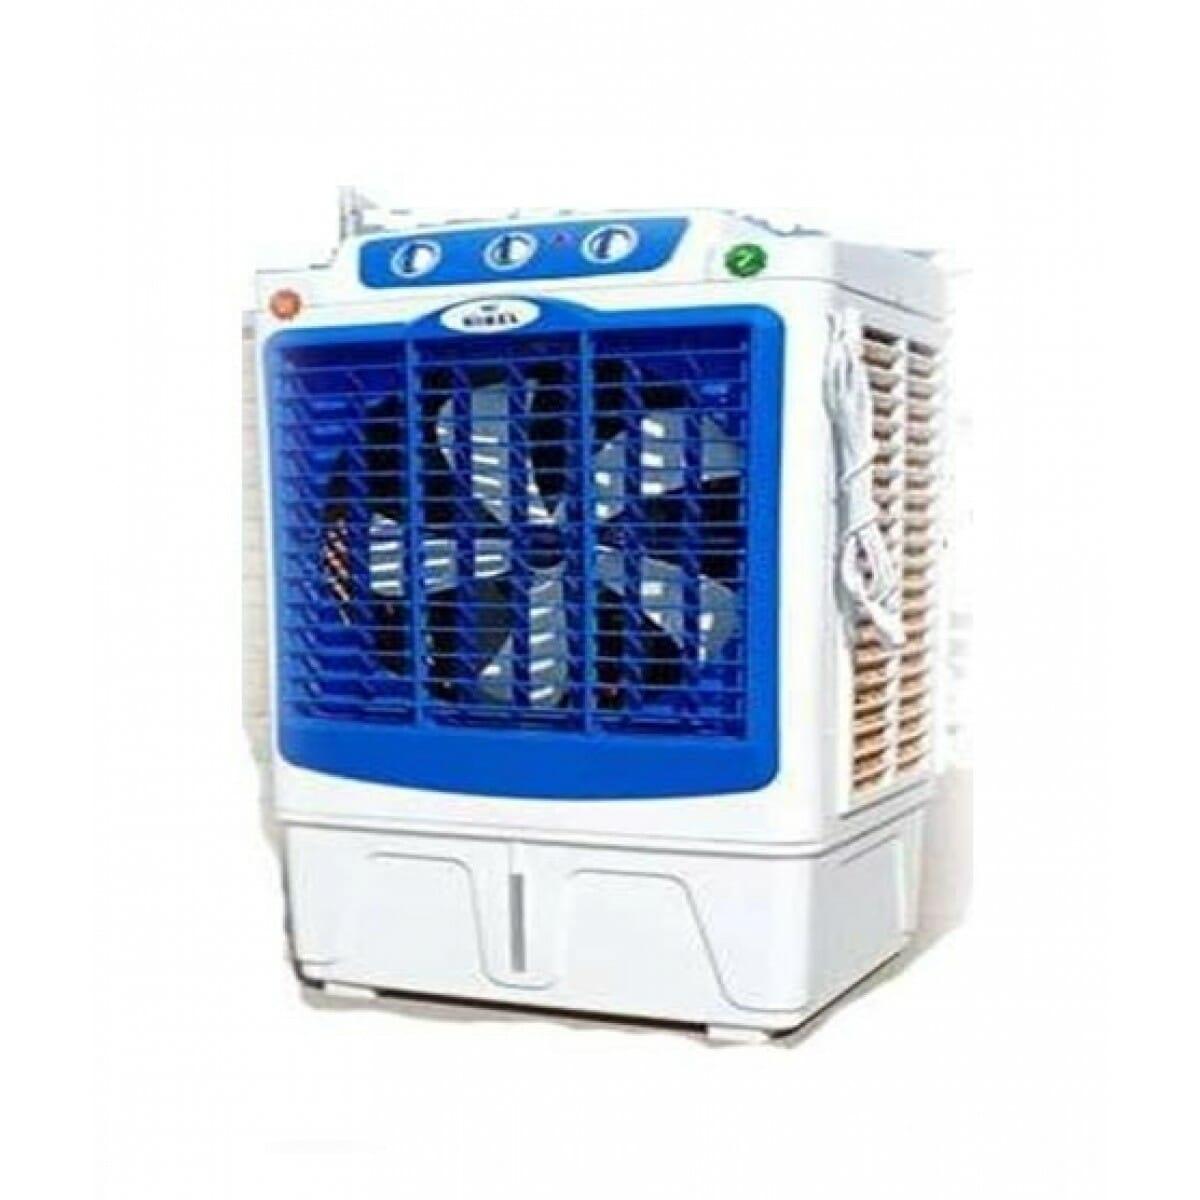 Gaba National Air Coolers - Best Cooler In Pakistan